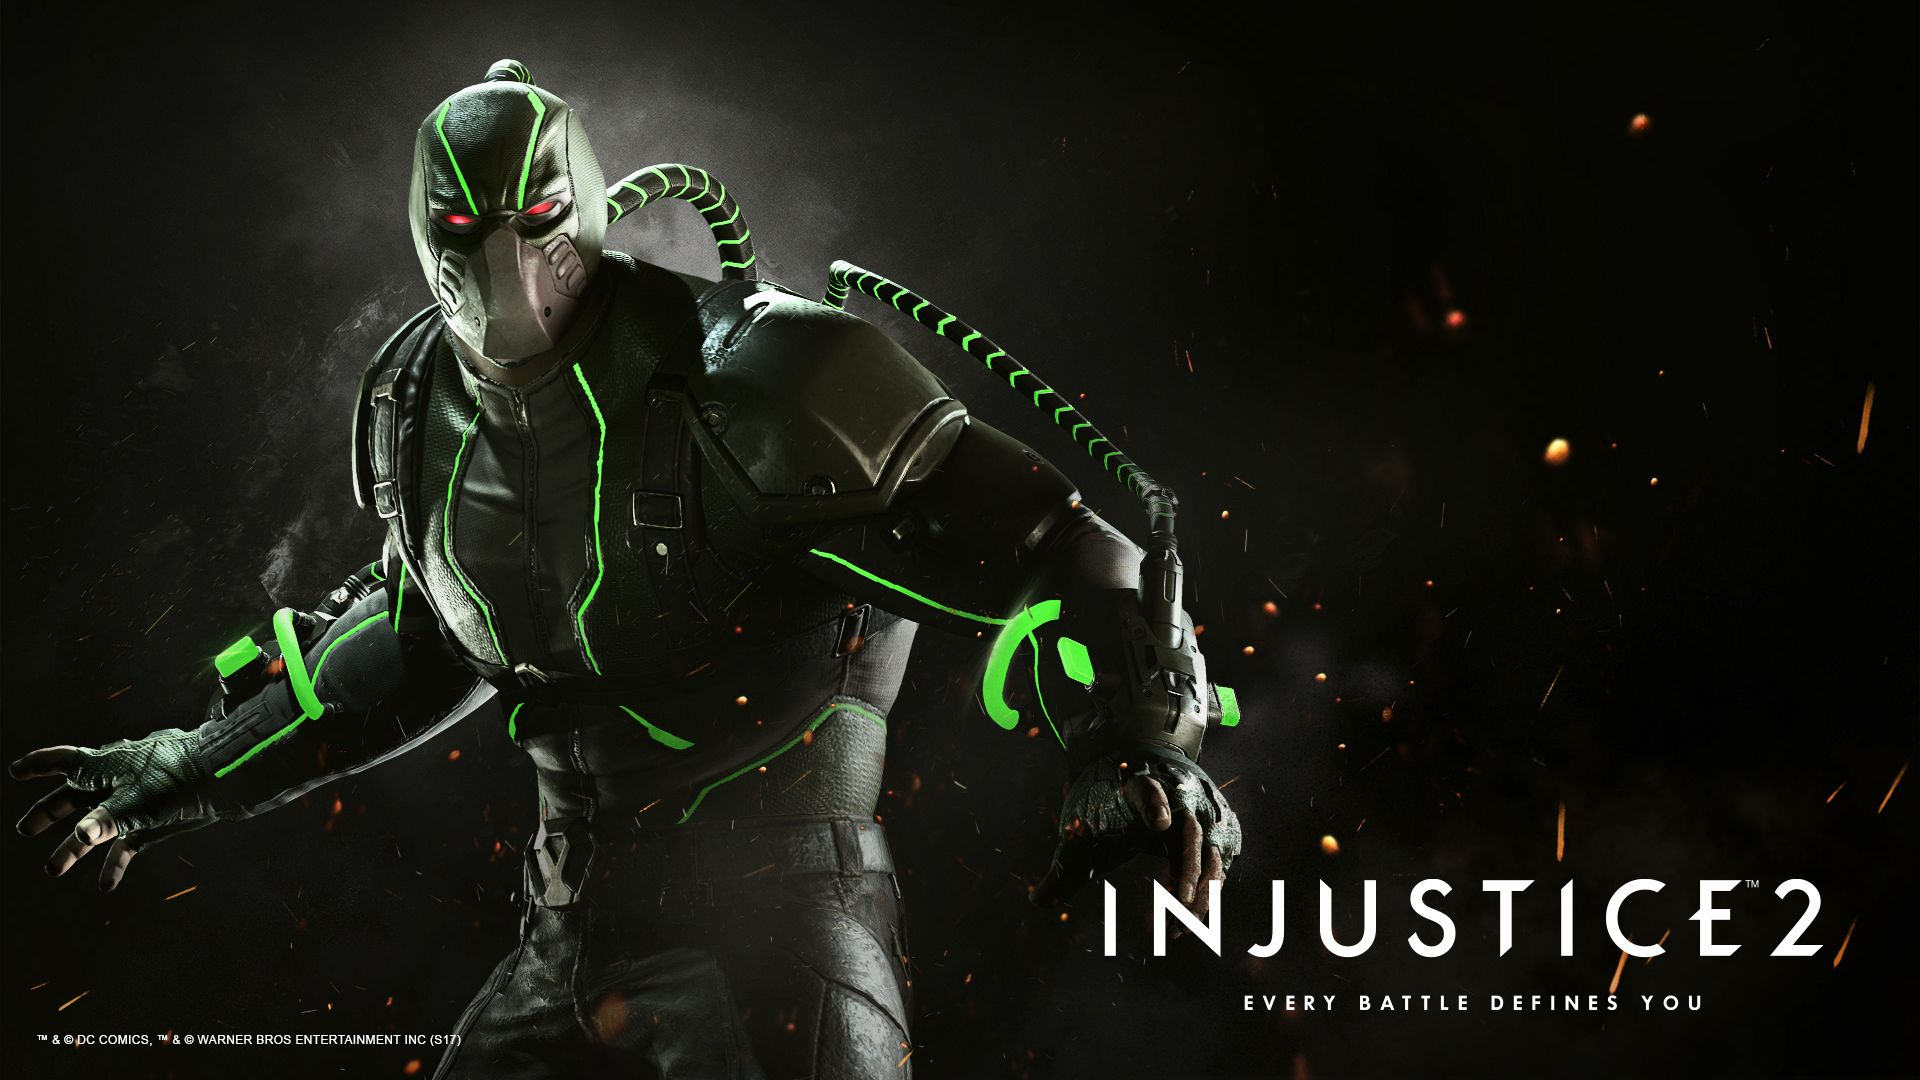 Bane (Injustice)